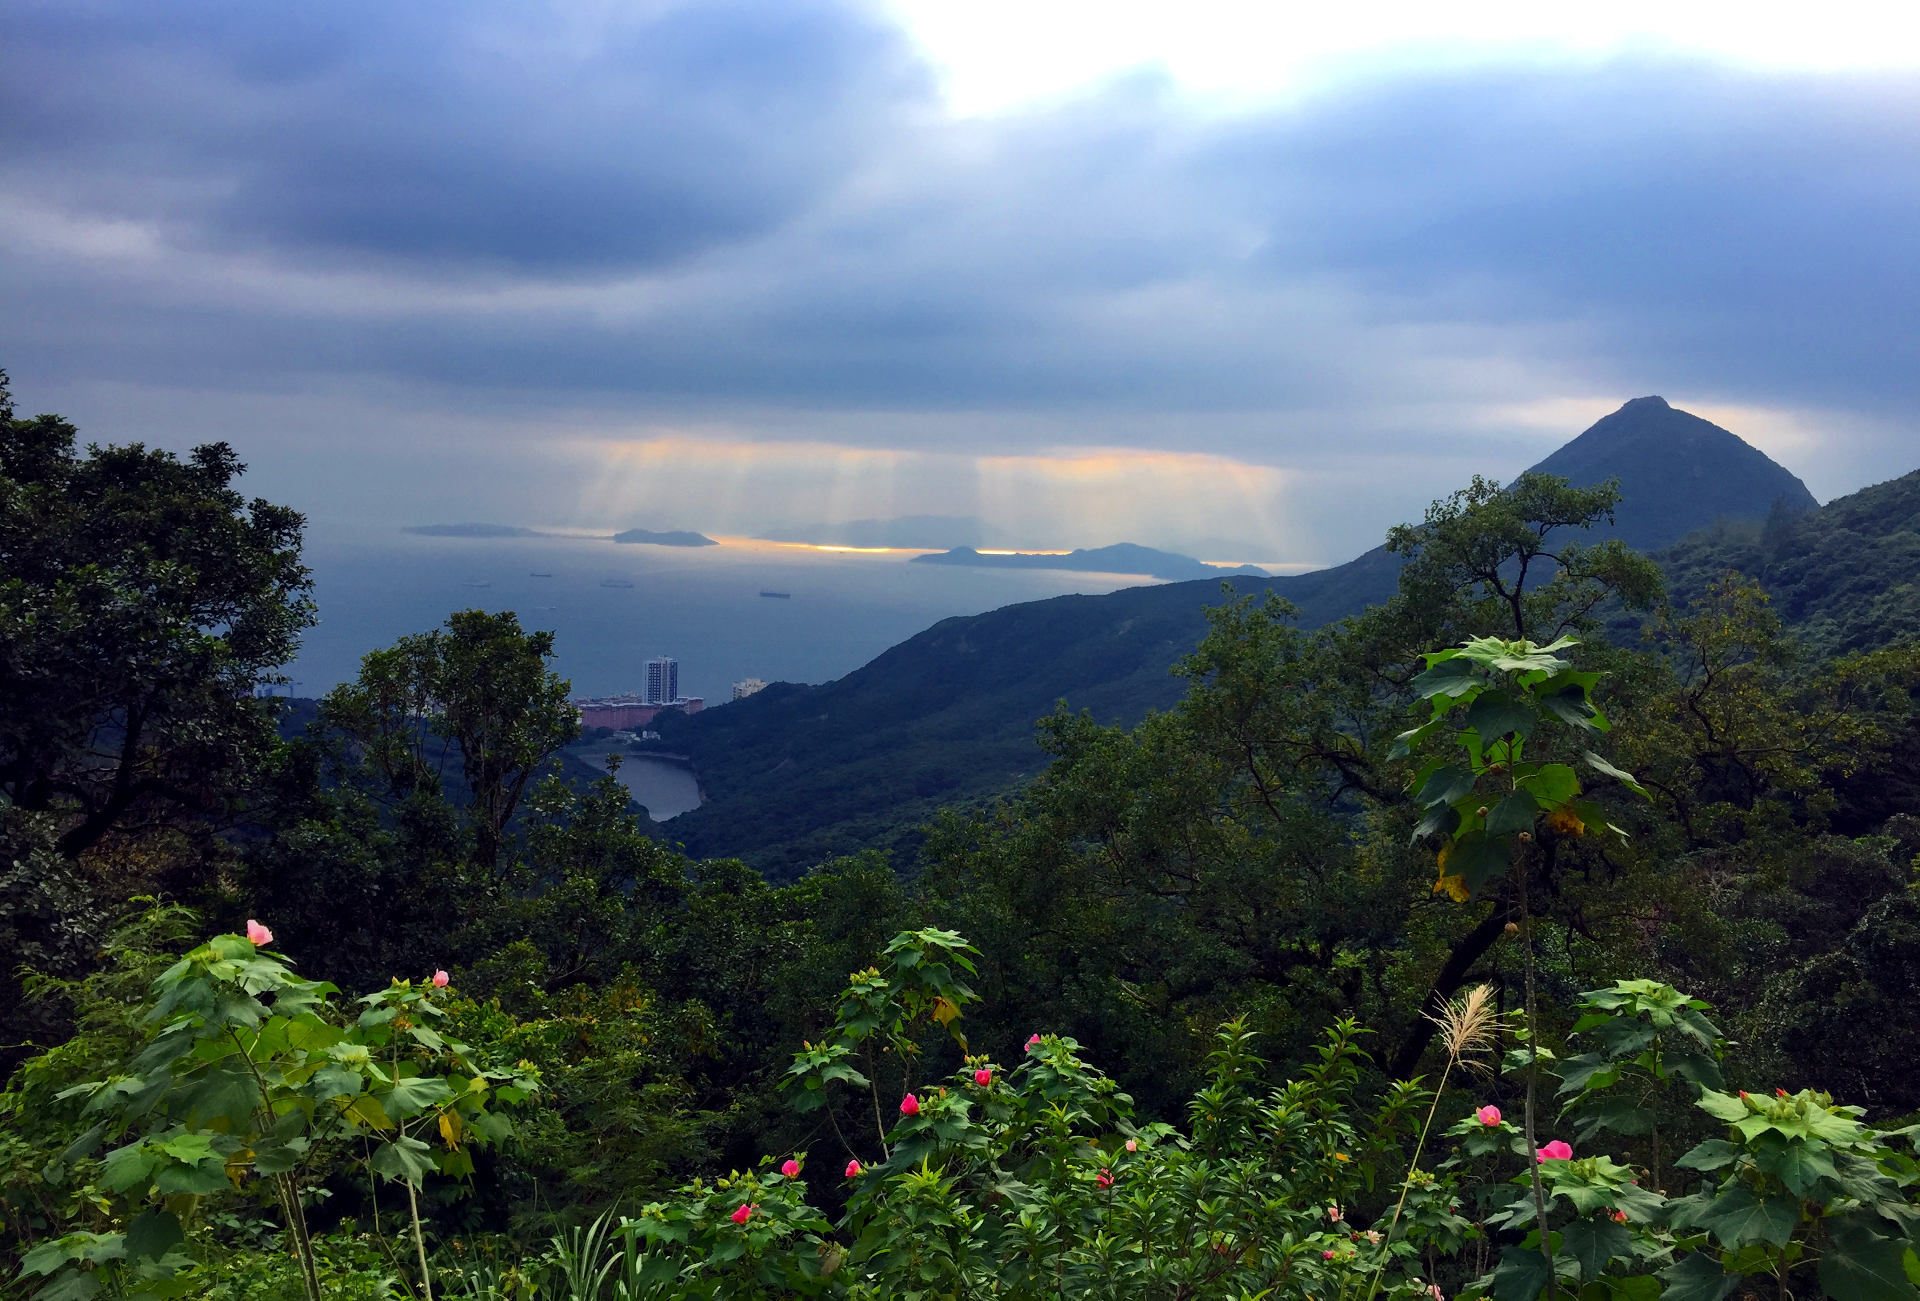 hongkong widok peek wzgorze wiktorii iglawpodrozy